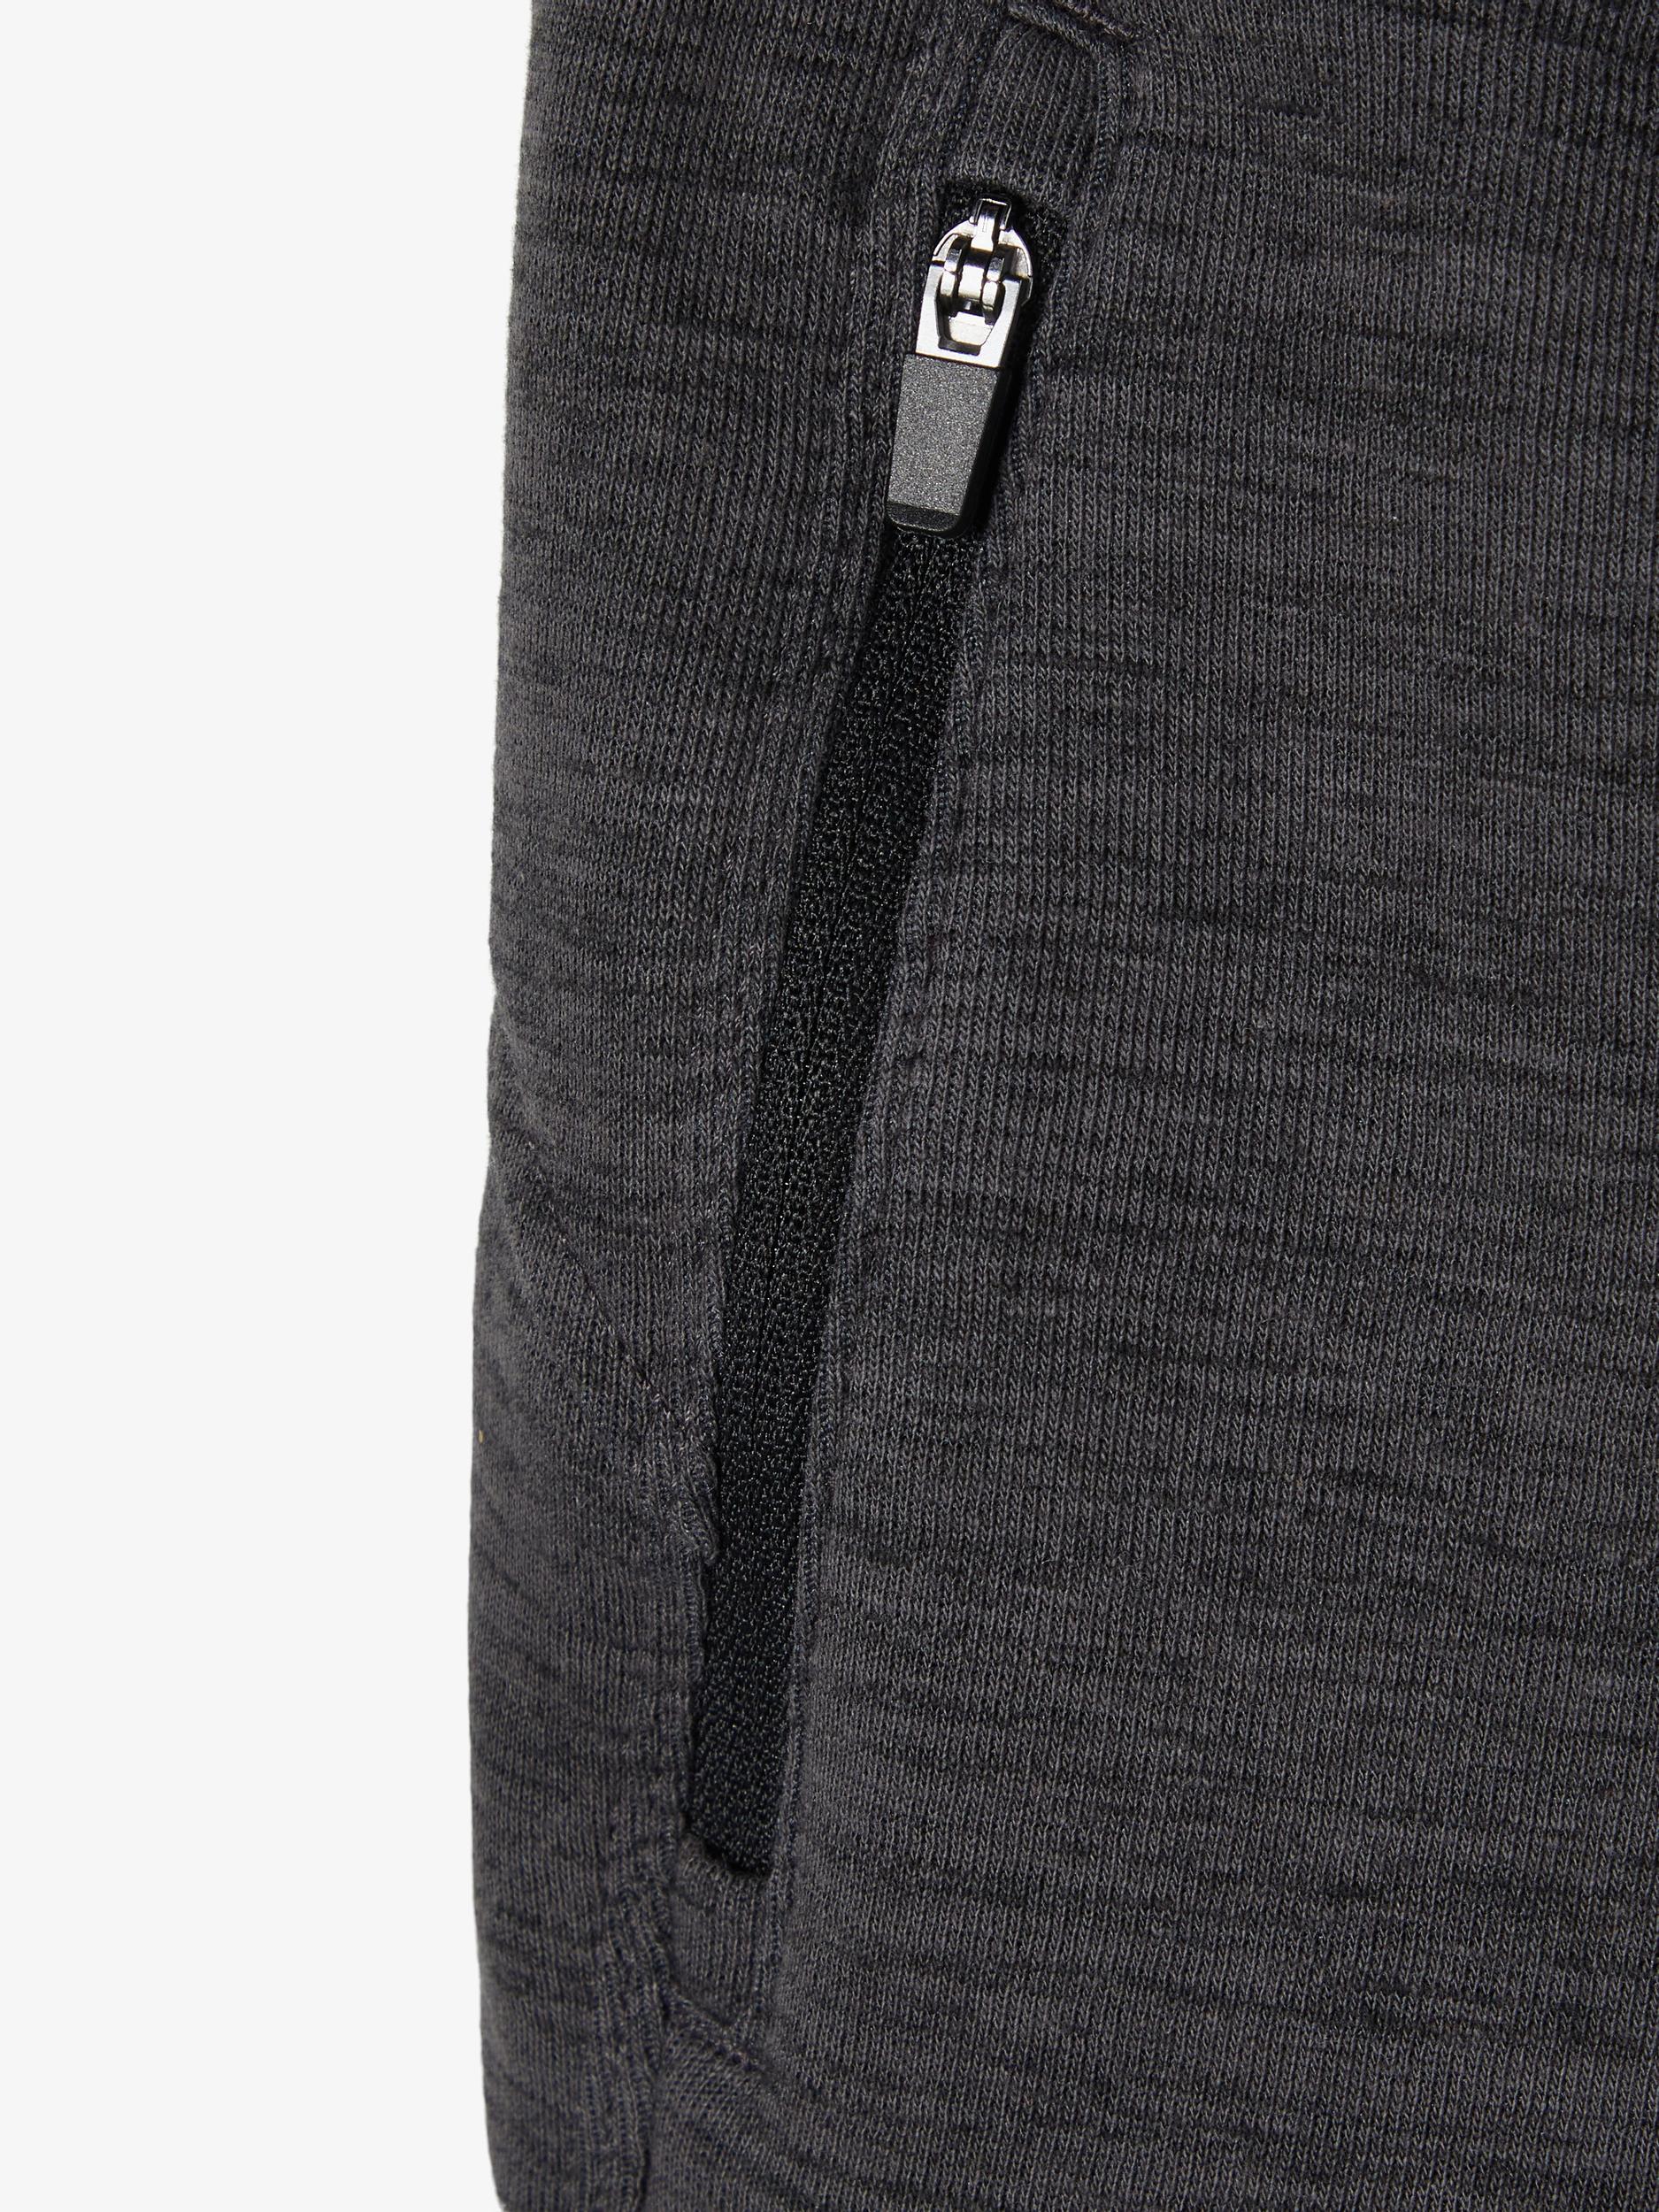 Name It Scottt sweat shorts, asphalt, 92